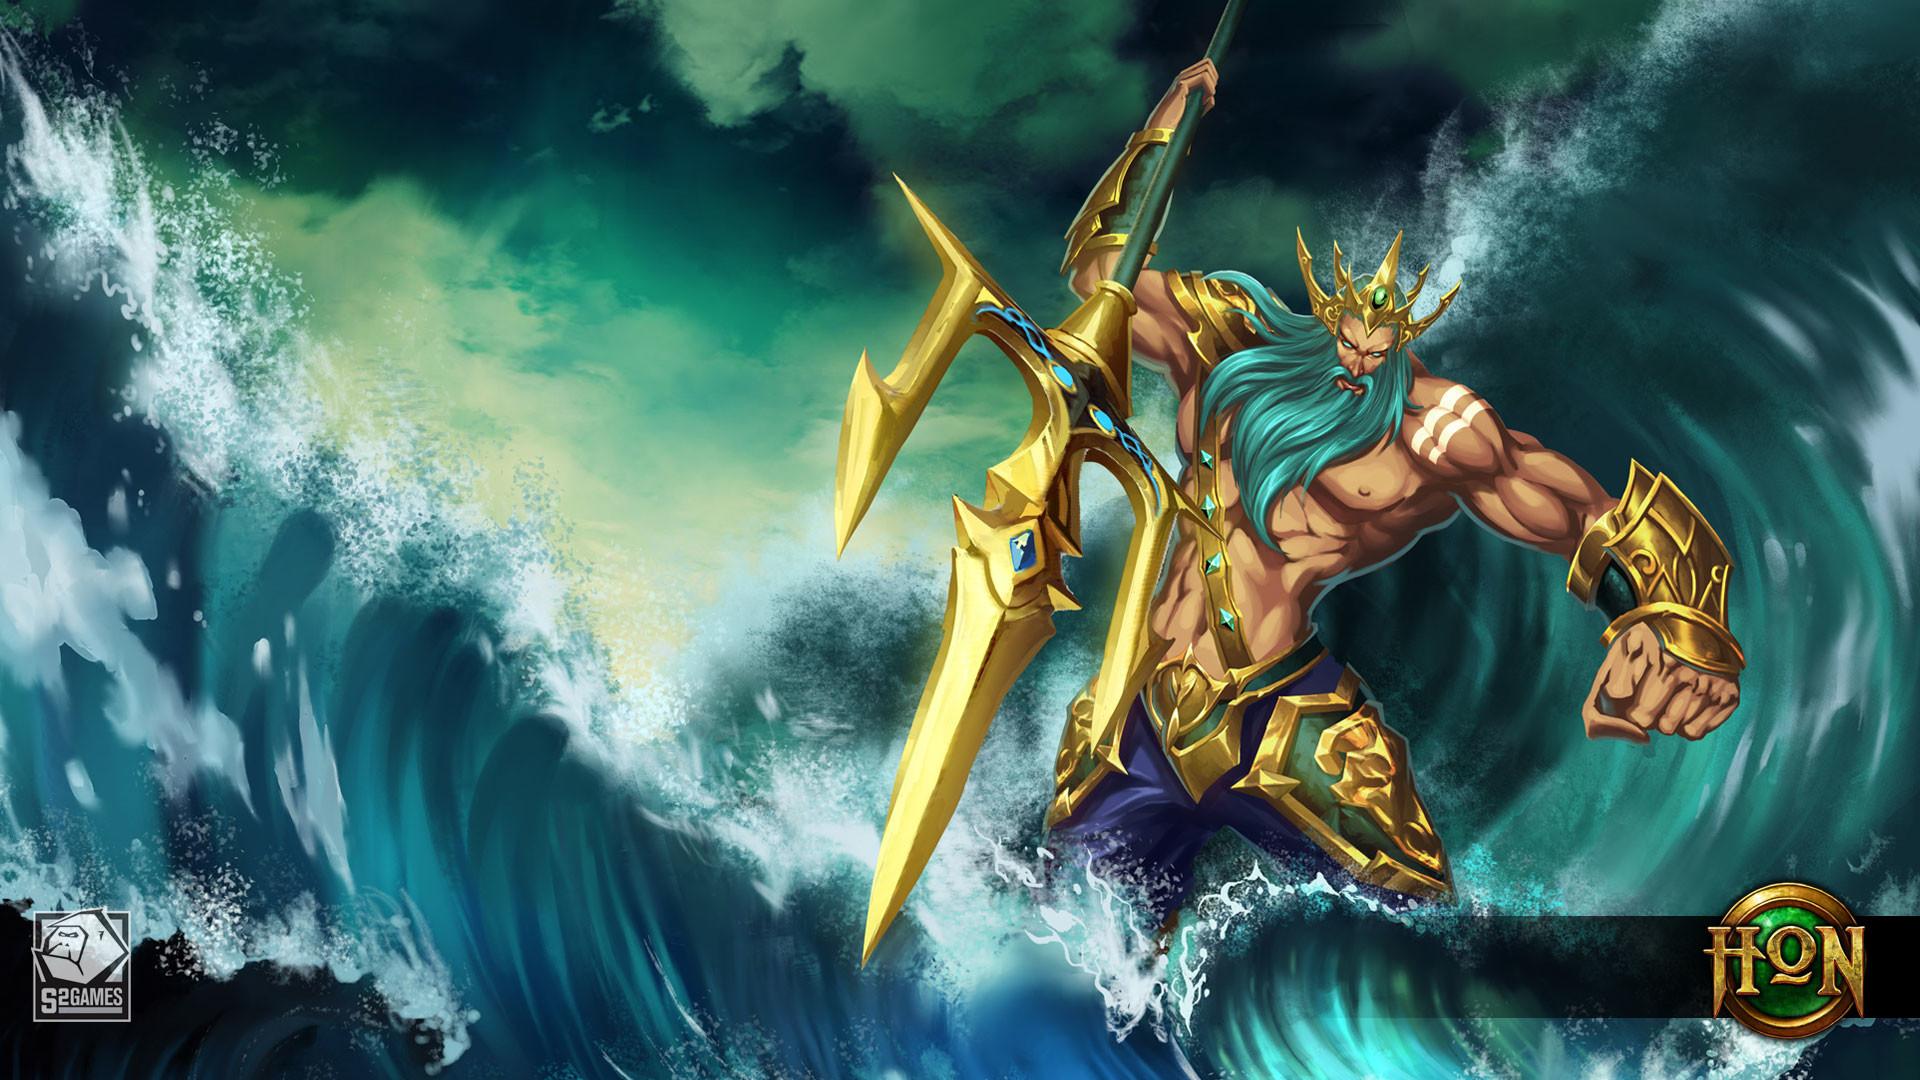 Res: 1920x1080, Poseidon